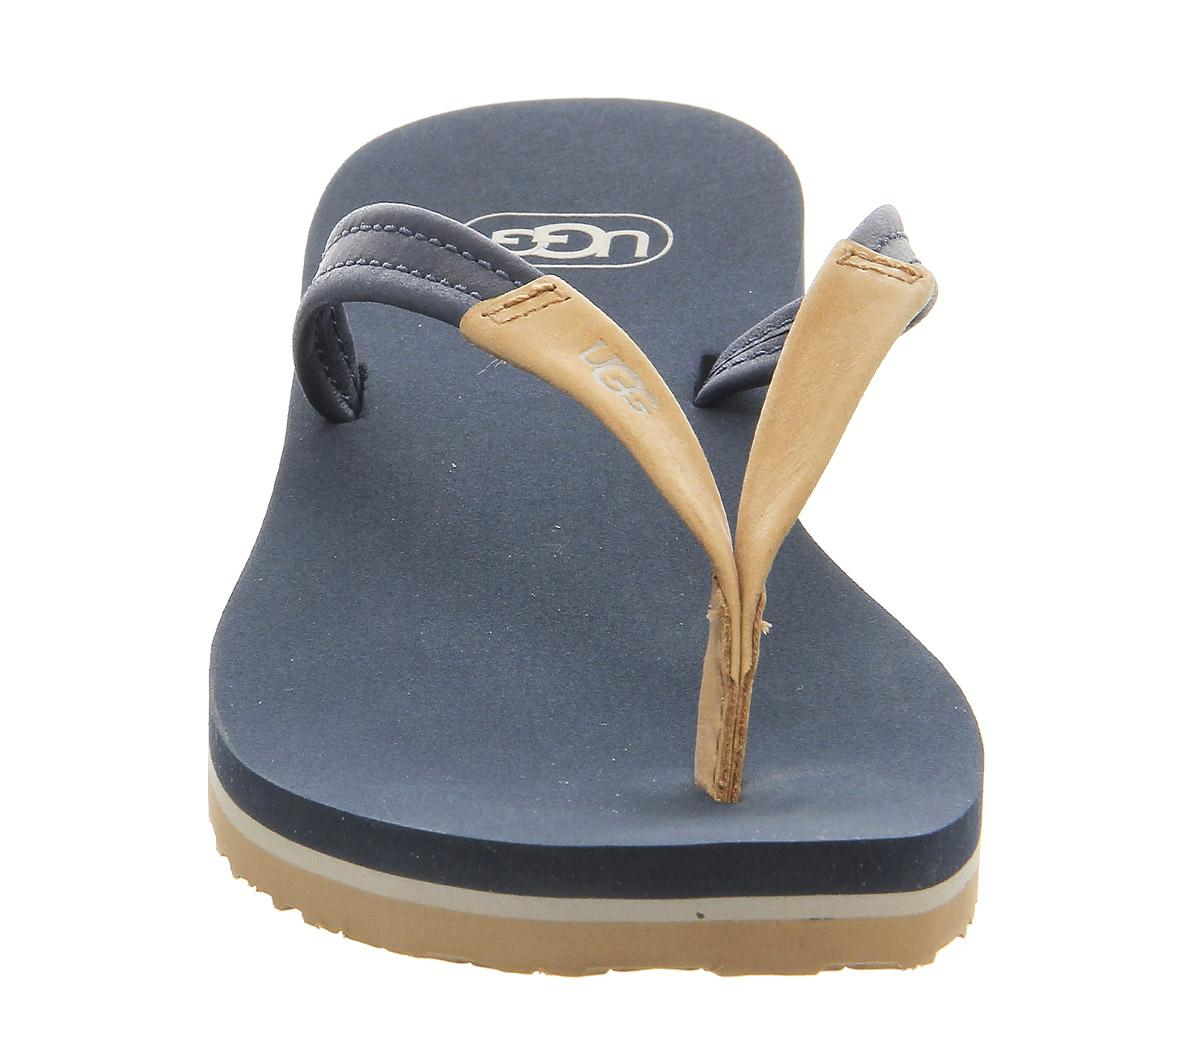 Ugg Leather Magnolia Flip Flop In Navy Blue - Lyst-4827